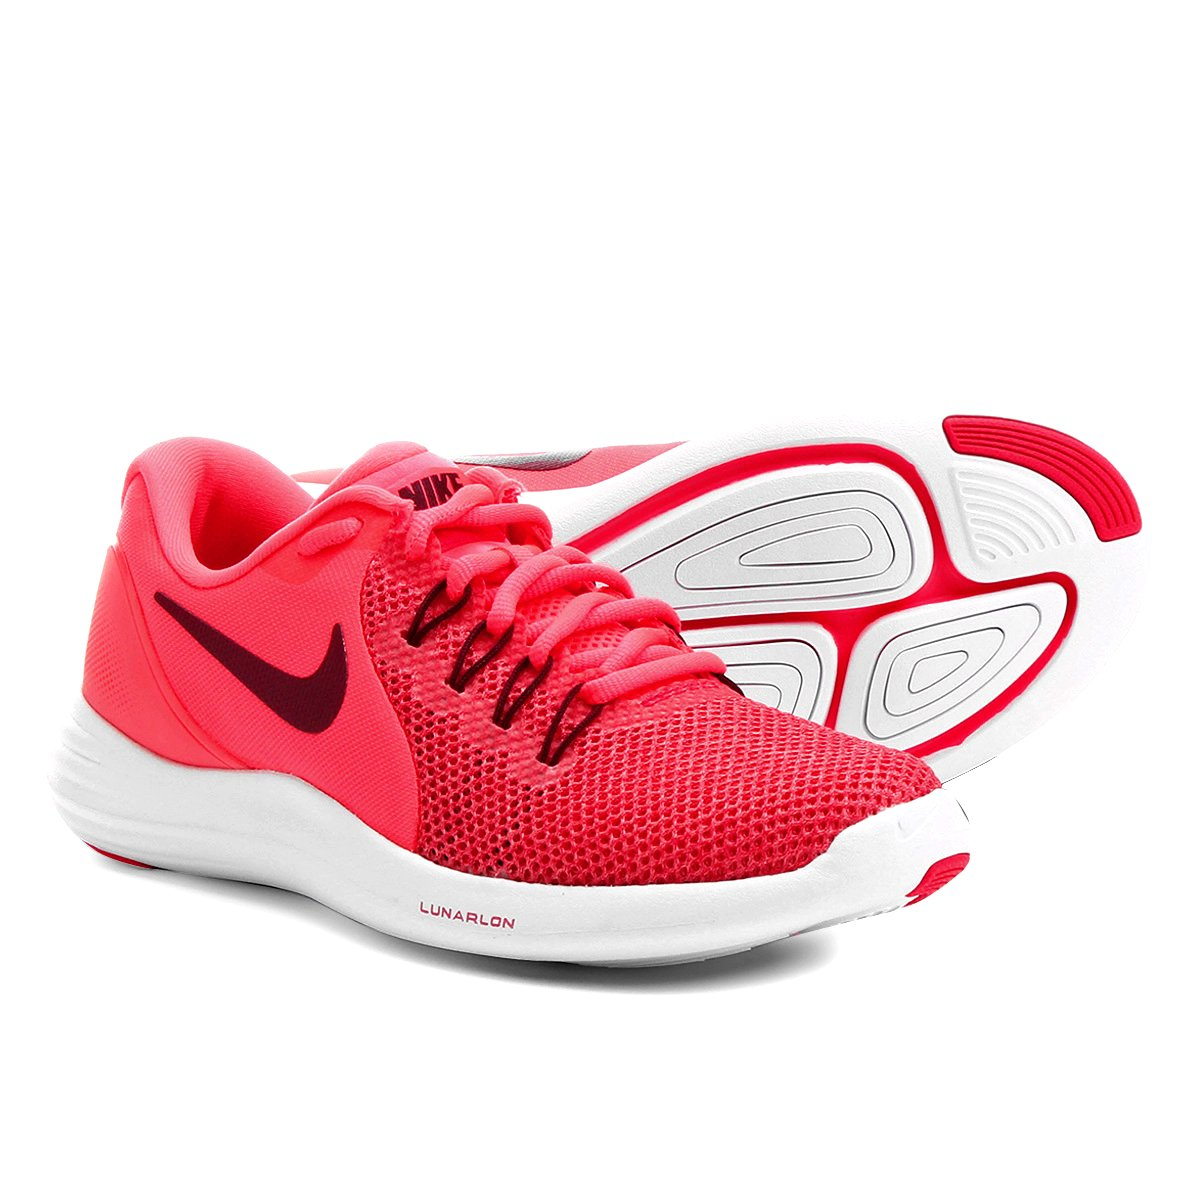 Nike Lunar Apparent Pink Gold Nike Shox R5 Womens Retail Sale  8c4f2845d